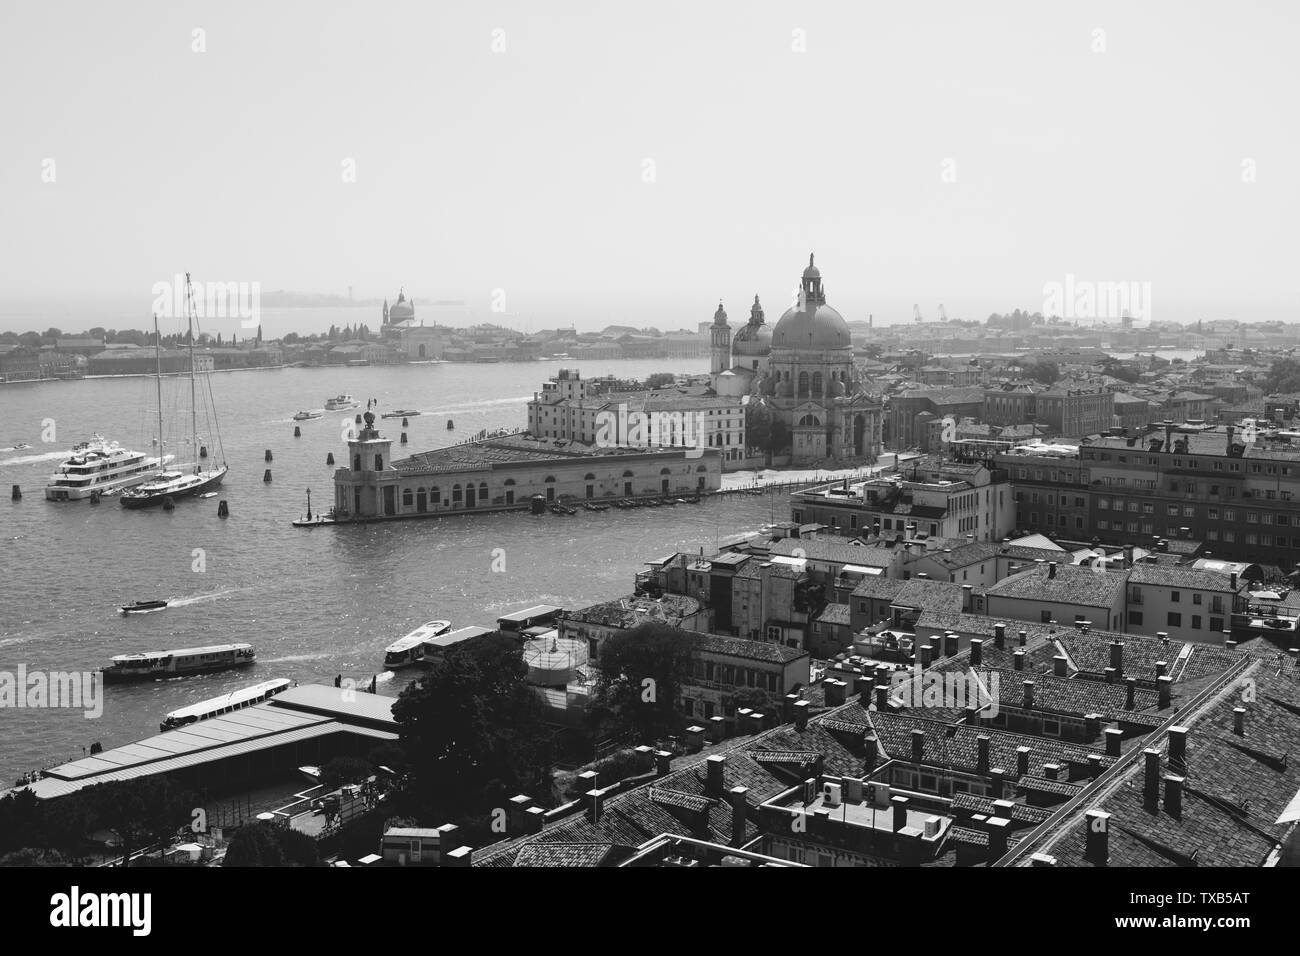 Panoramic view of Venice city and away Basilica di Santa Maria della Salute (Saint Mary of Healt) from St Mark's Campanile (Campanile di San Marco). L - Stock Image